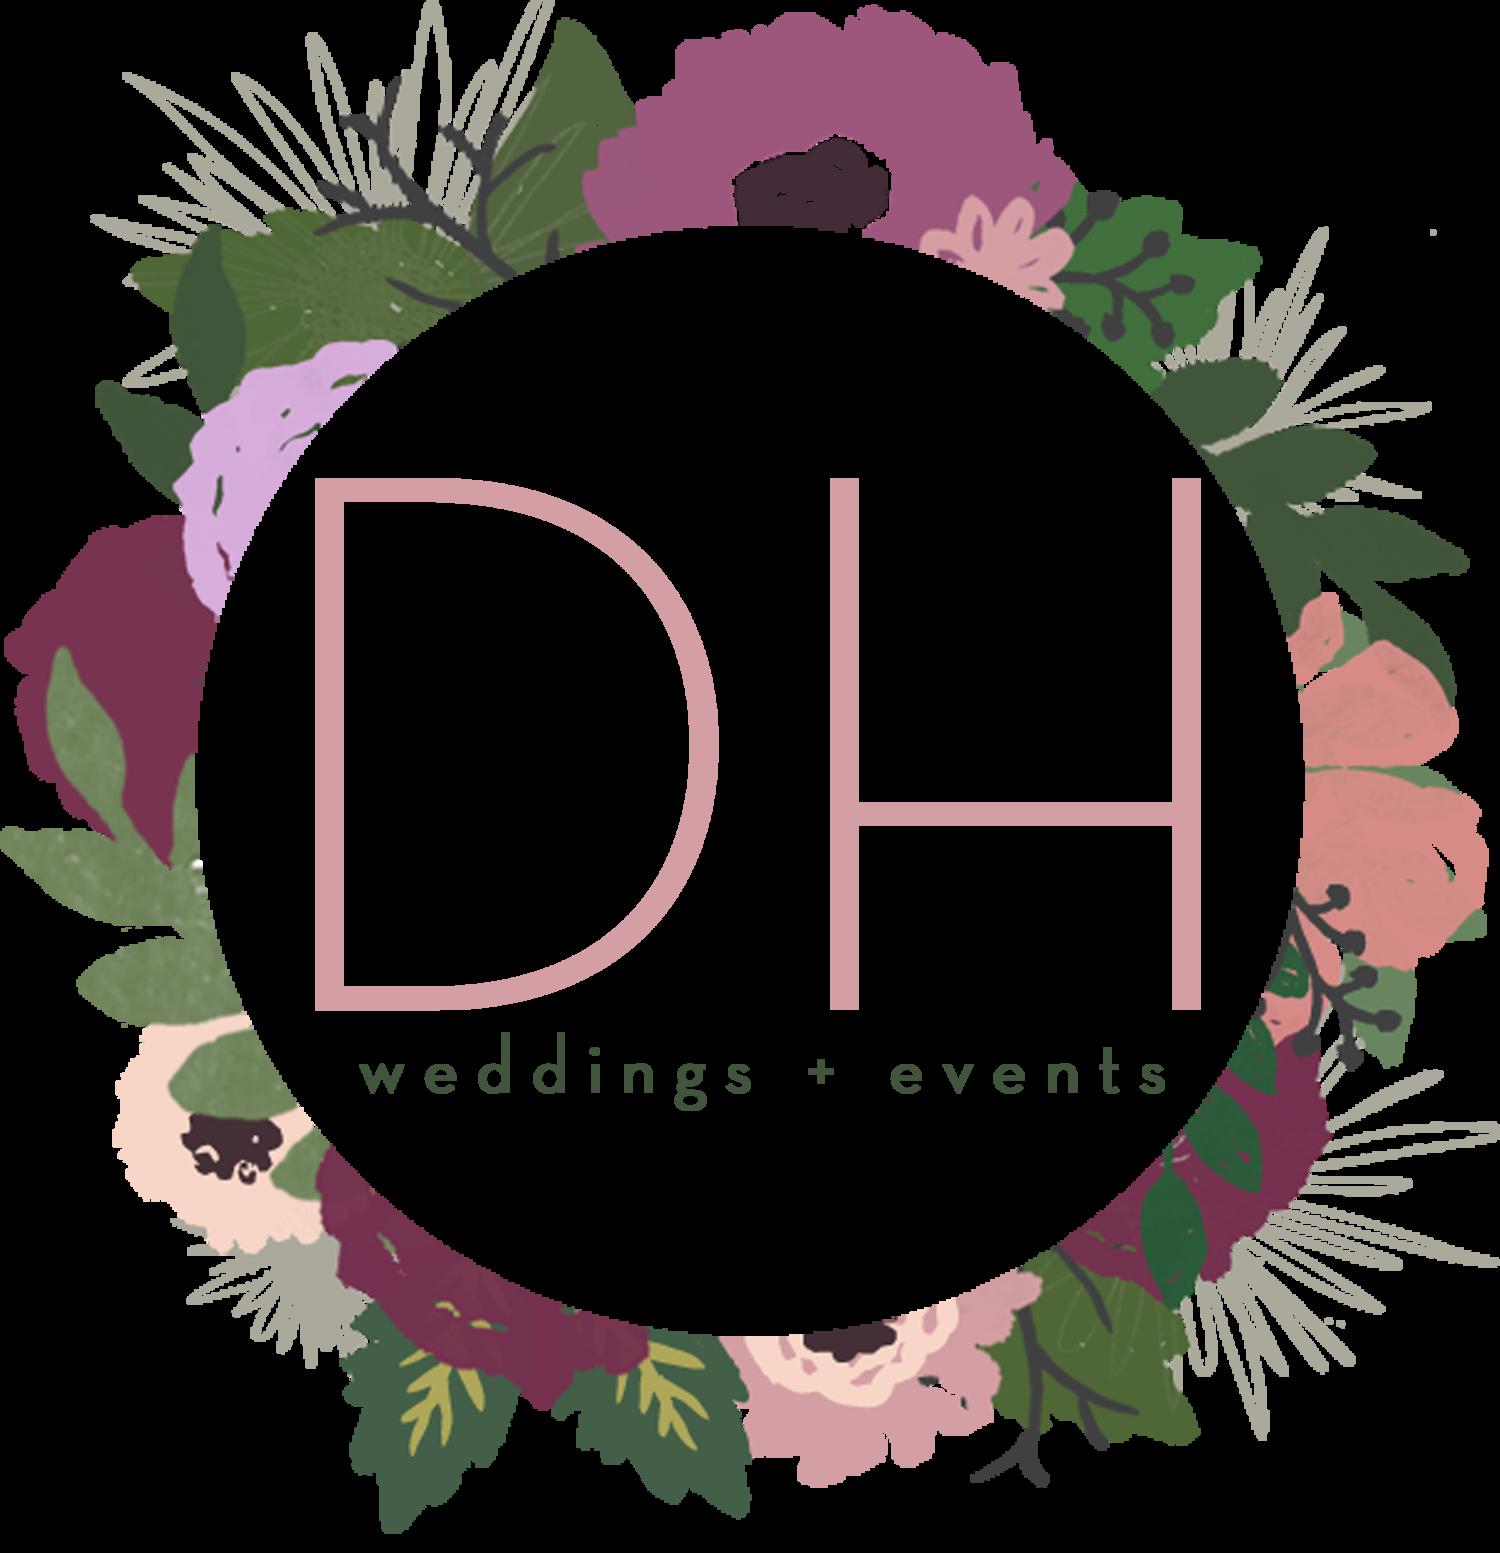 Hill weddings events . Daffodil clipart field daffodil